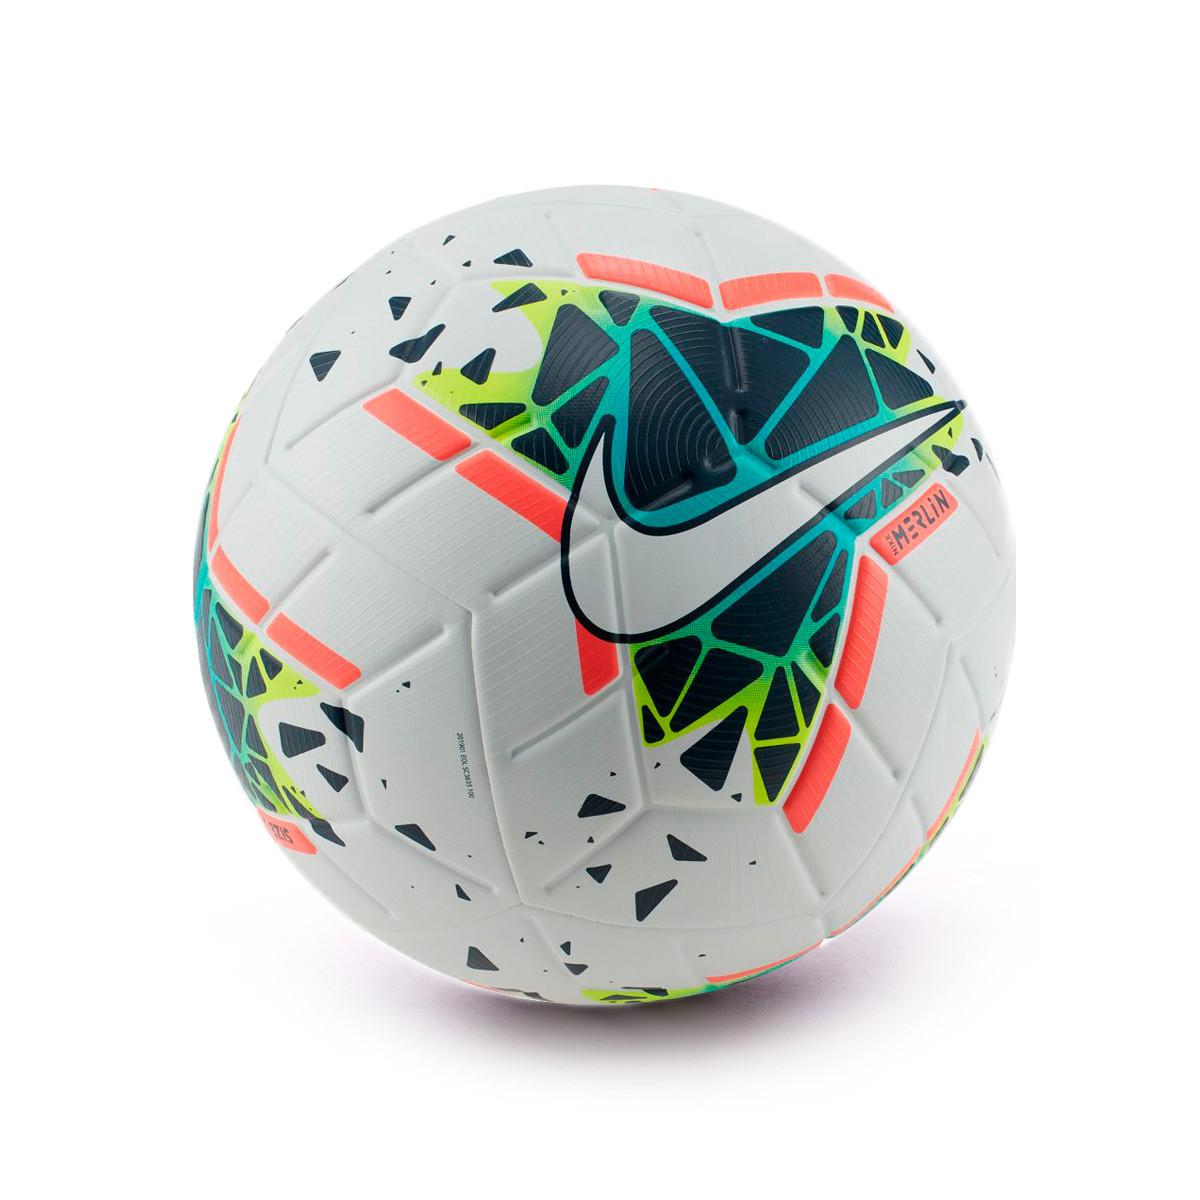 tallarines ornamento Trágico  Ball Nike Merlin 2019-2020 White-Obsidian-Blue fury - Football store Fútbol  Emotion